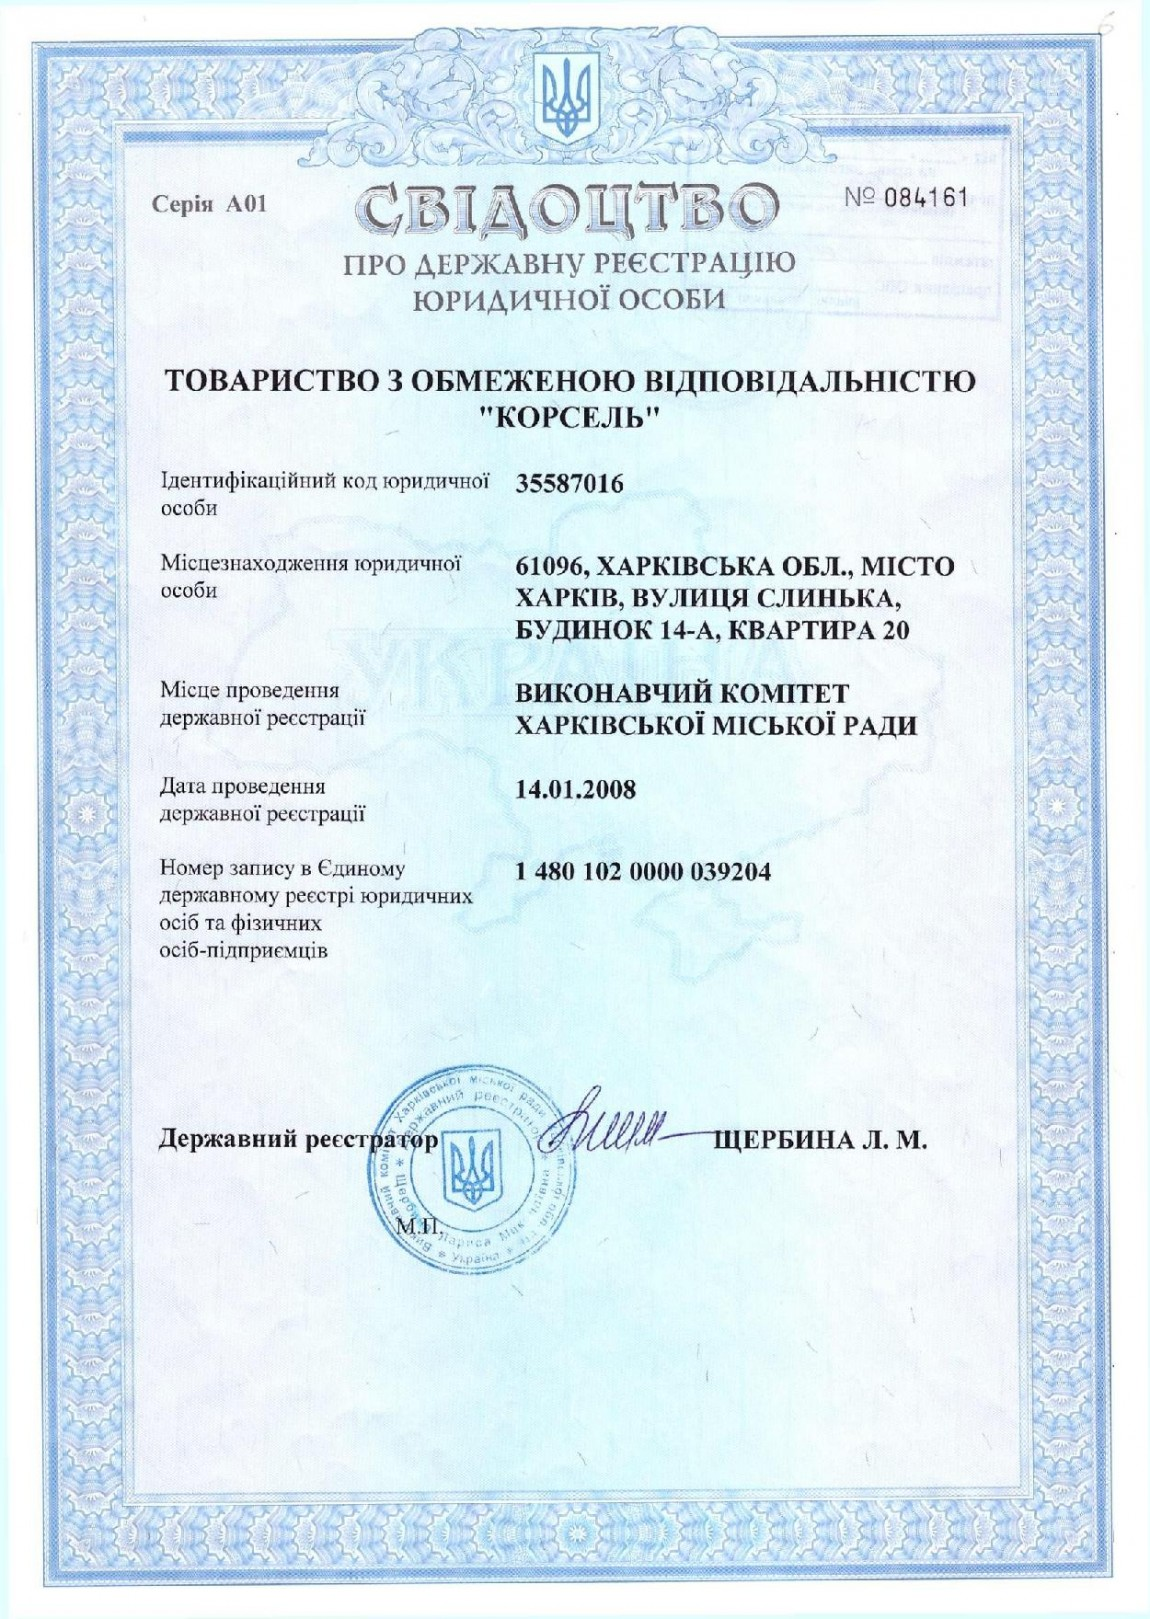 State_sertificate.jpg